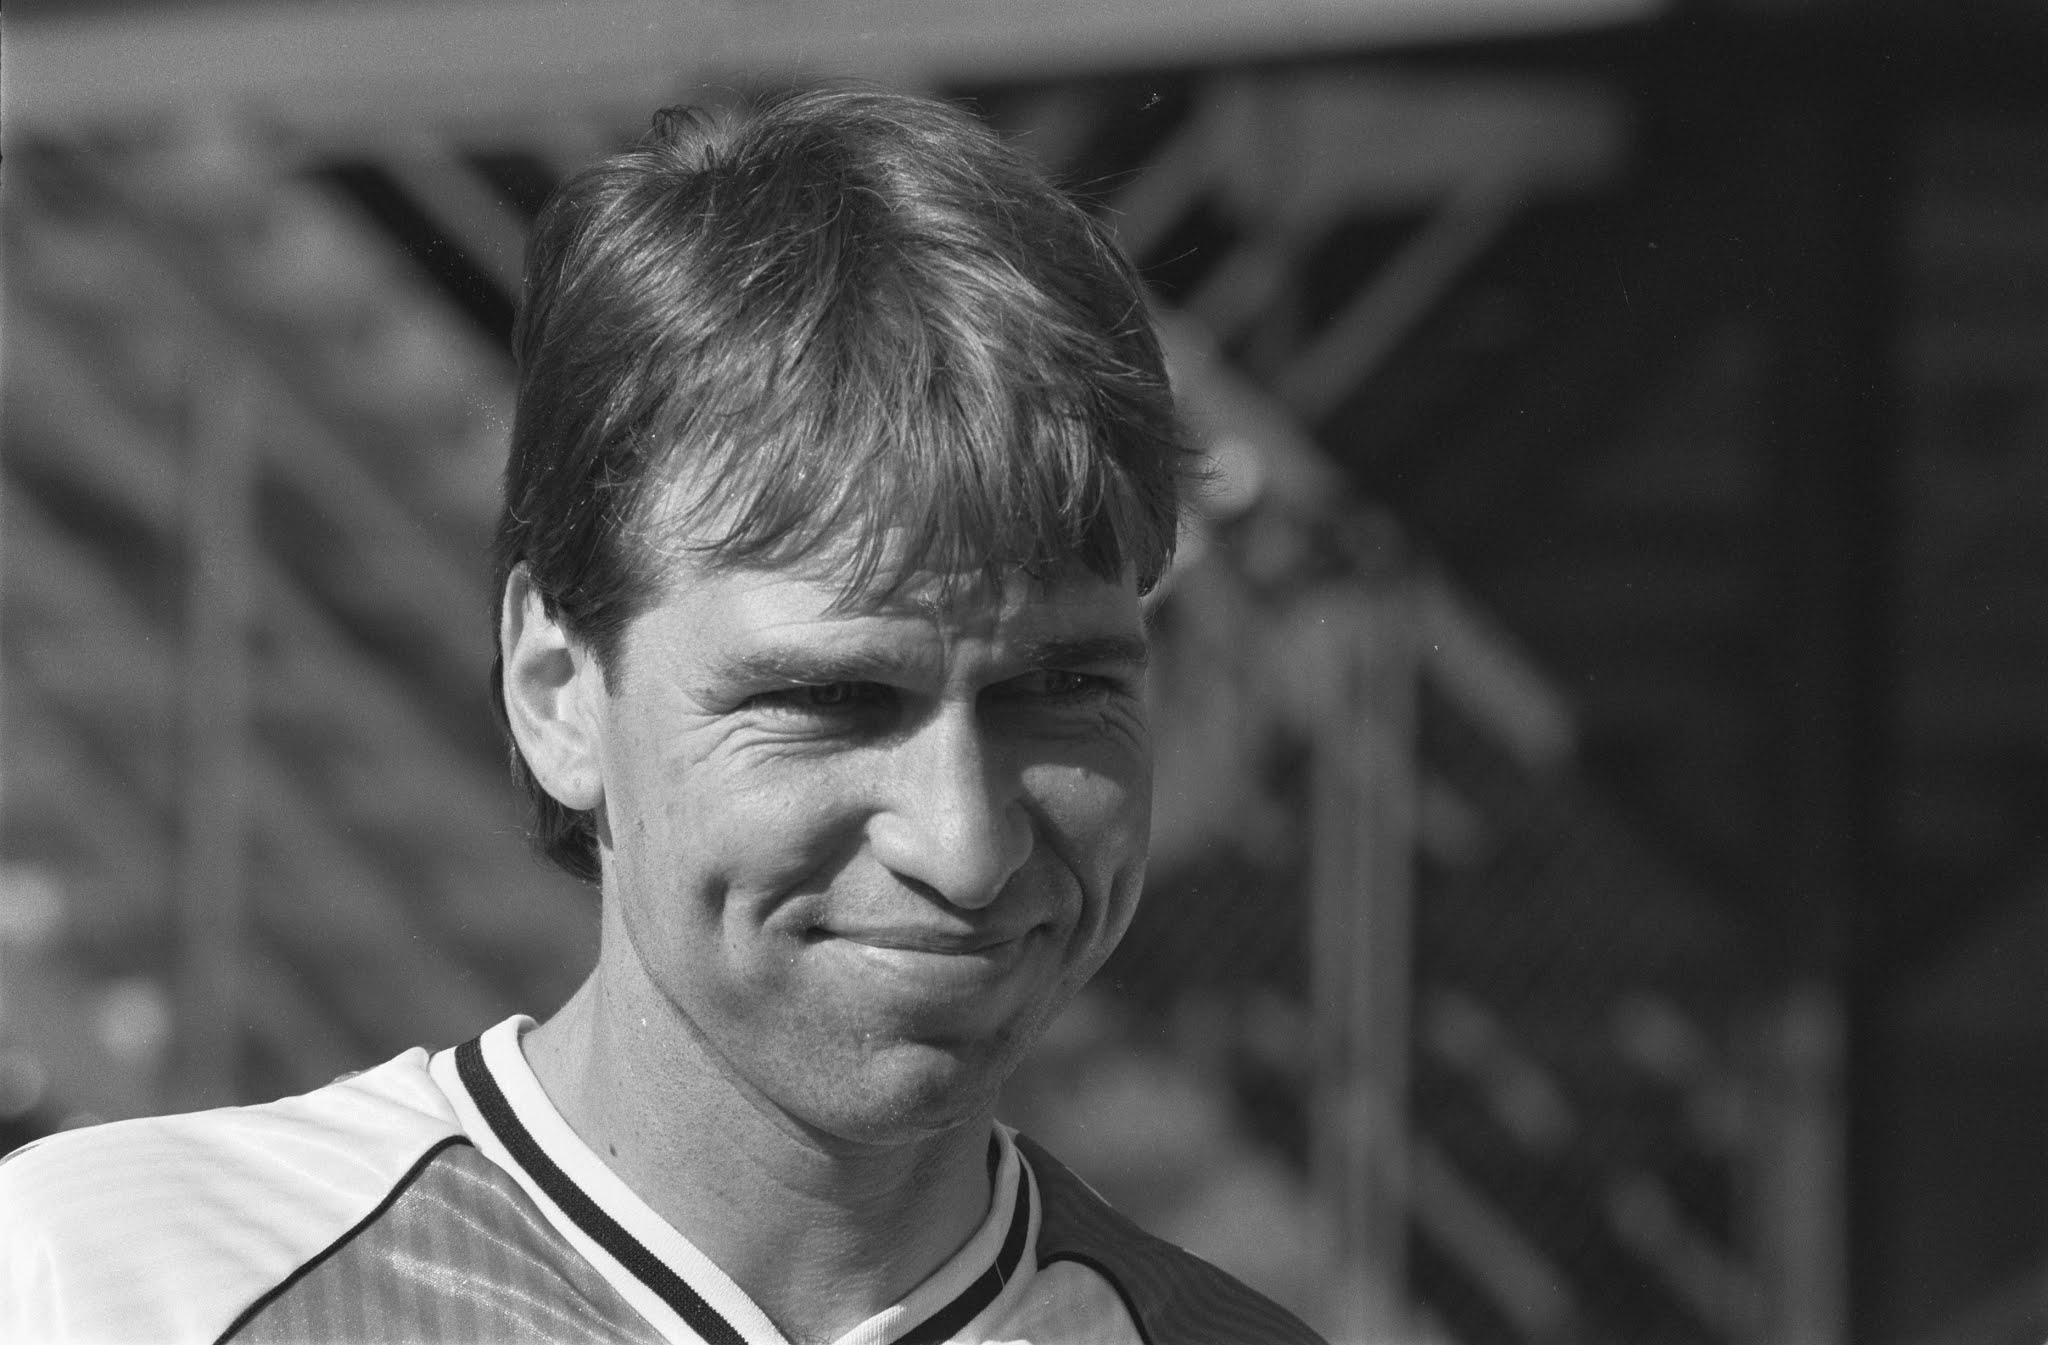 Pim Verbeek